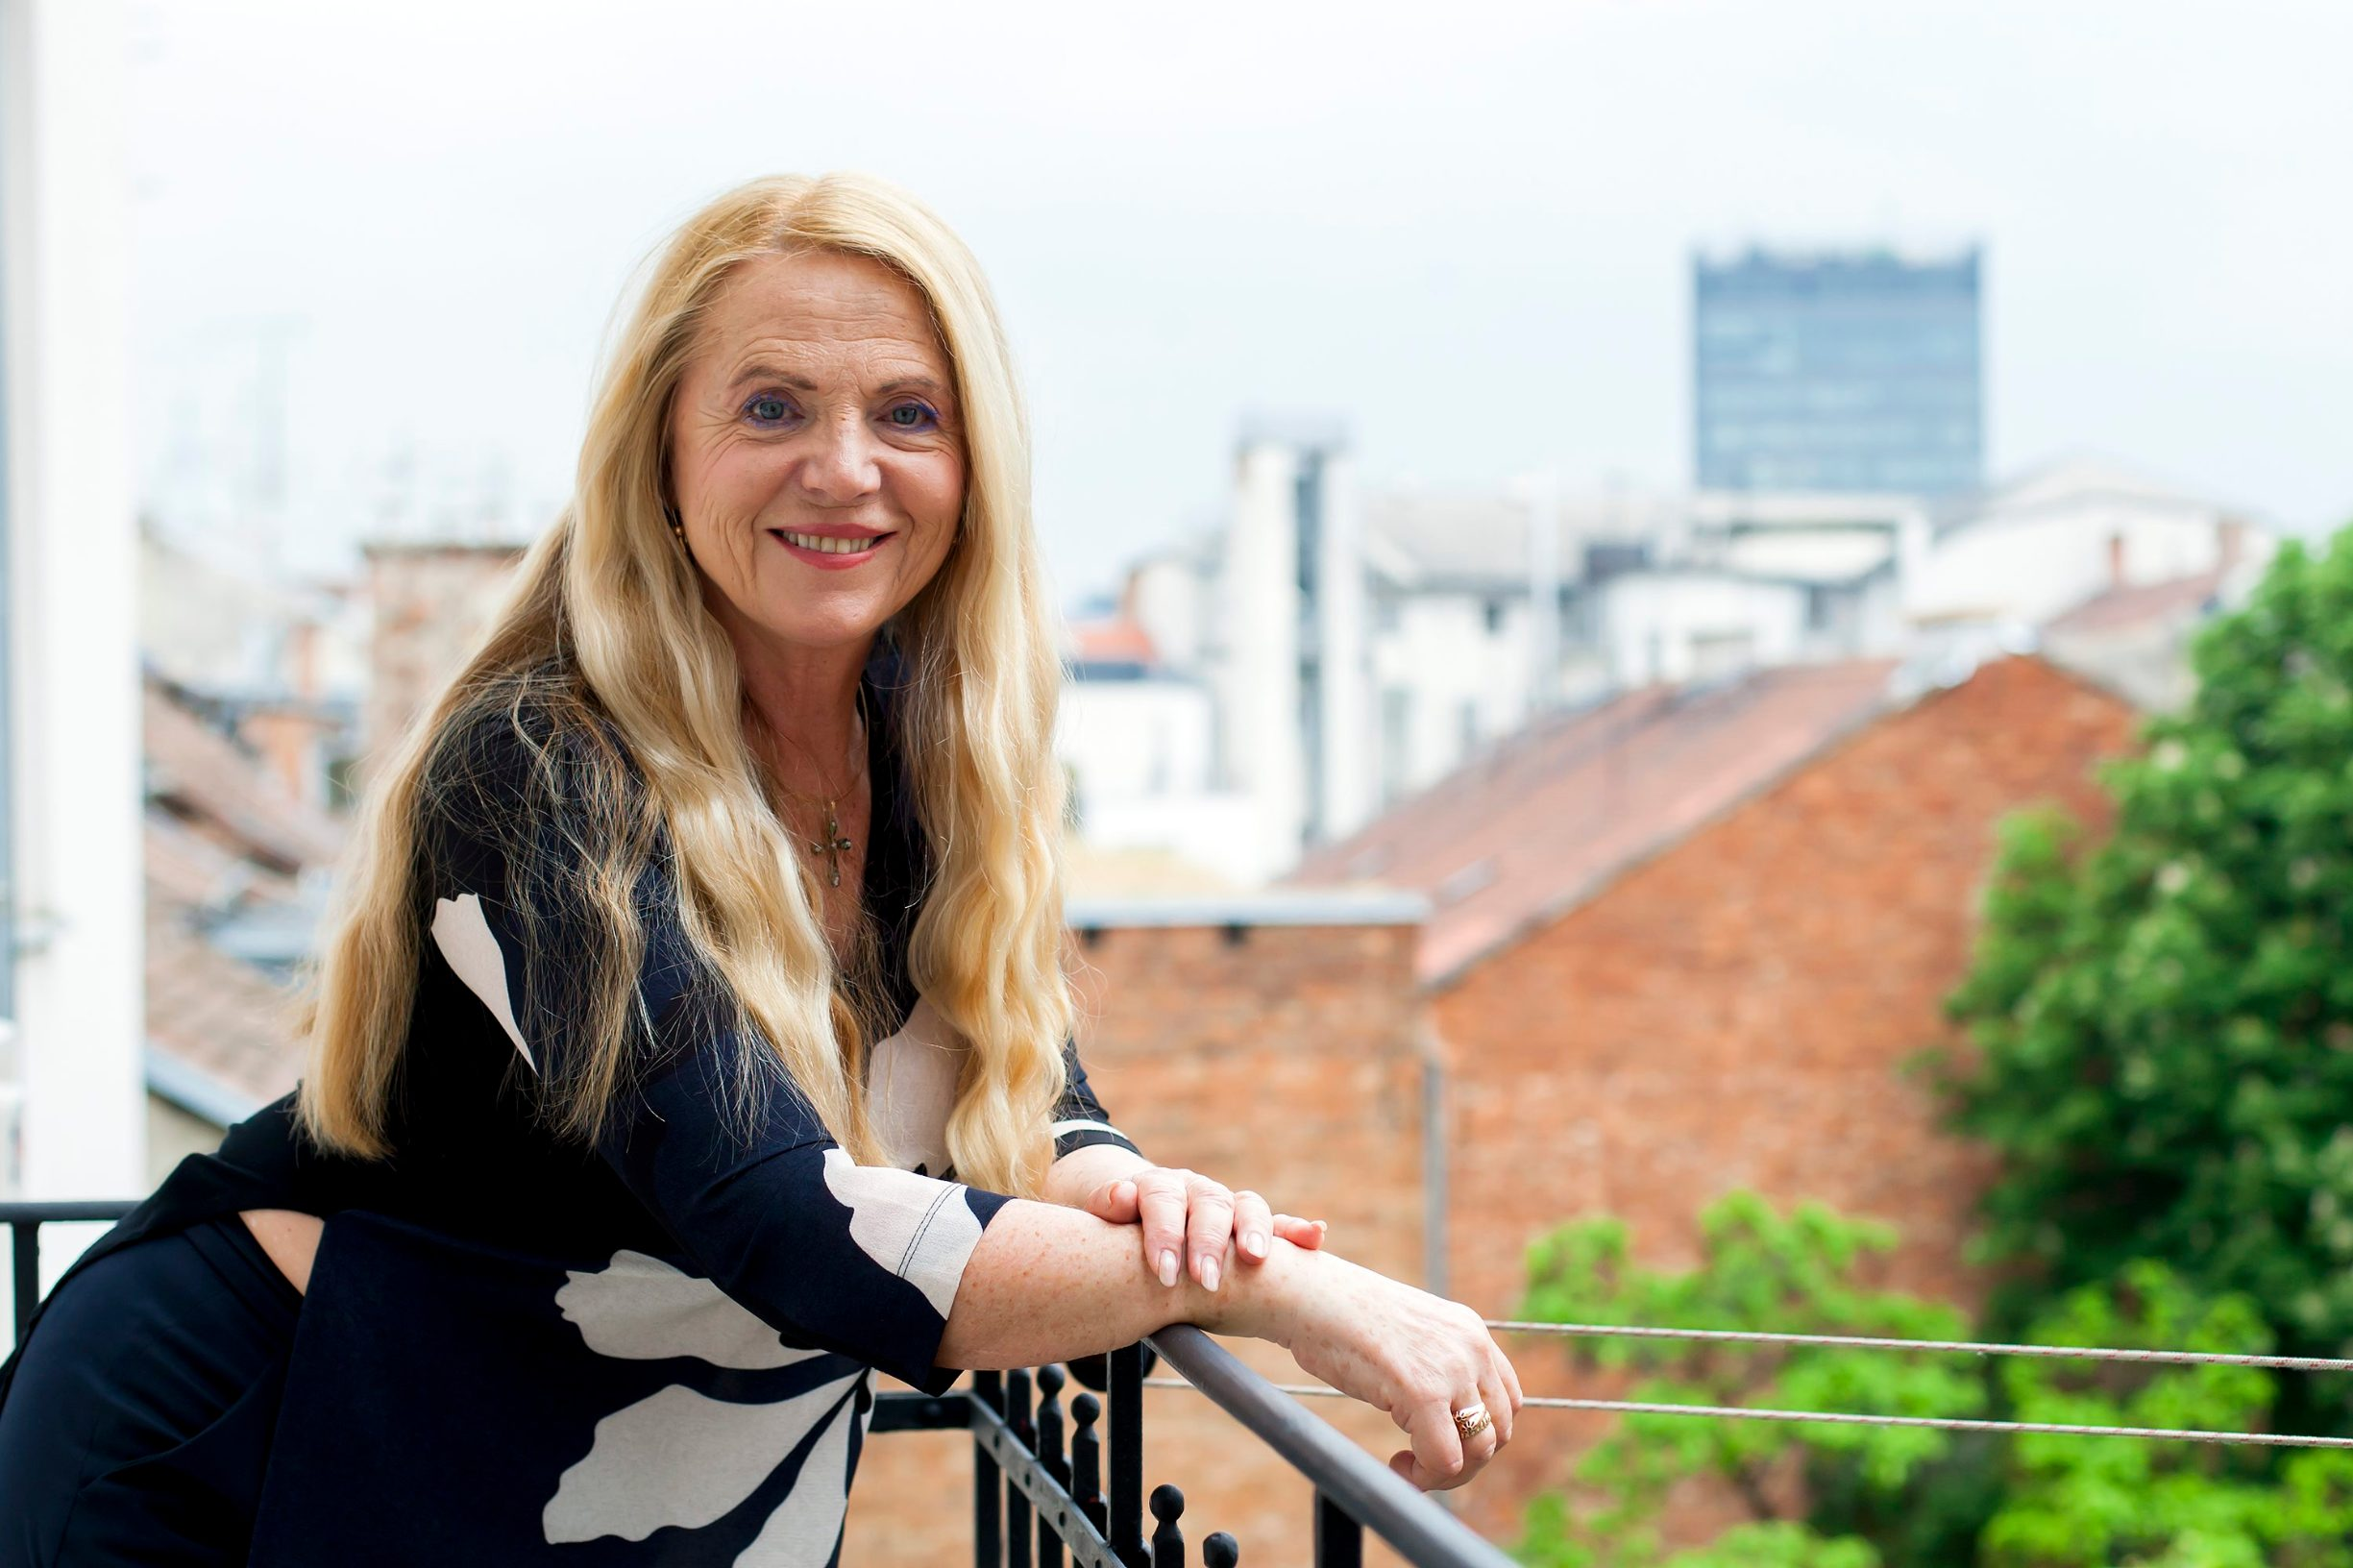 Zagreb, 040518. Amruseva 19. Perica Martinovic - voditeljica Drustva dramskih umjetnika. Foto: Tomislav Kristo / CROPIX